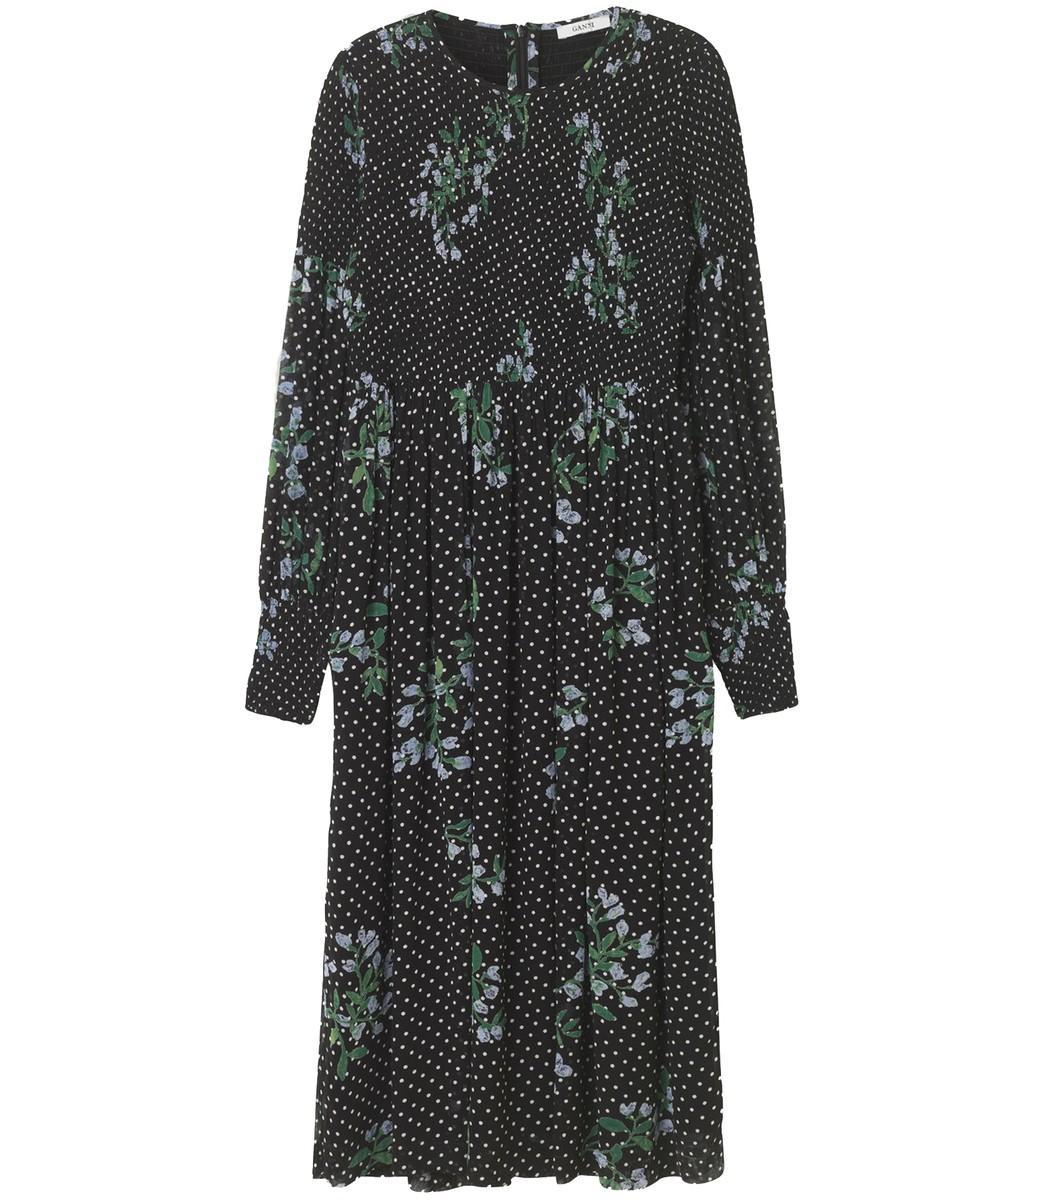 cff6d41e Ganni Rometty Smocked Printed Georgette Midi Dress In Black | ModeSens